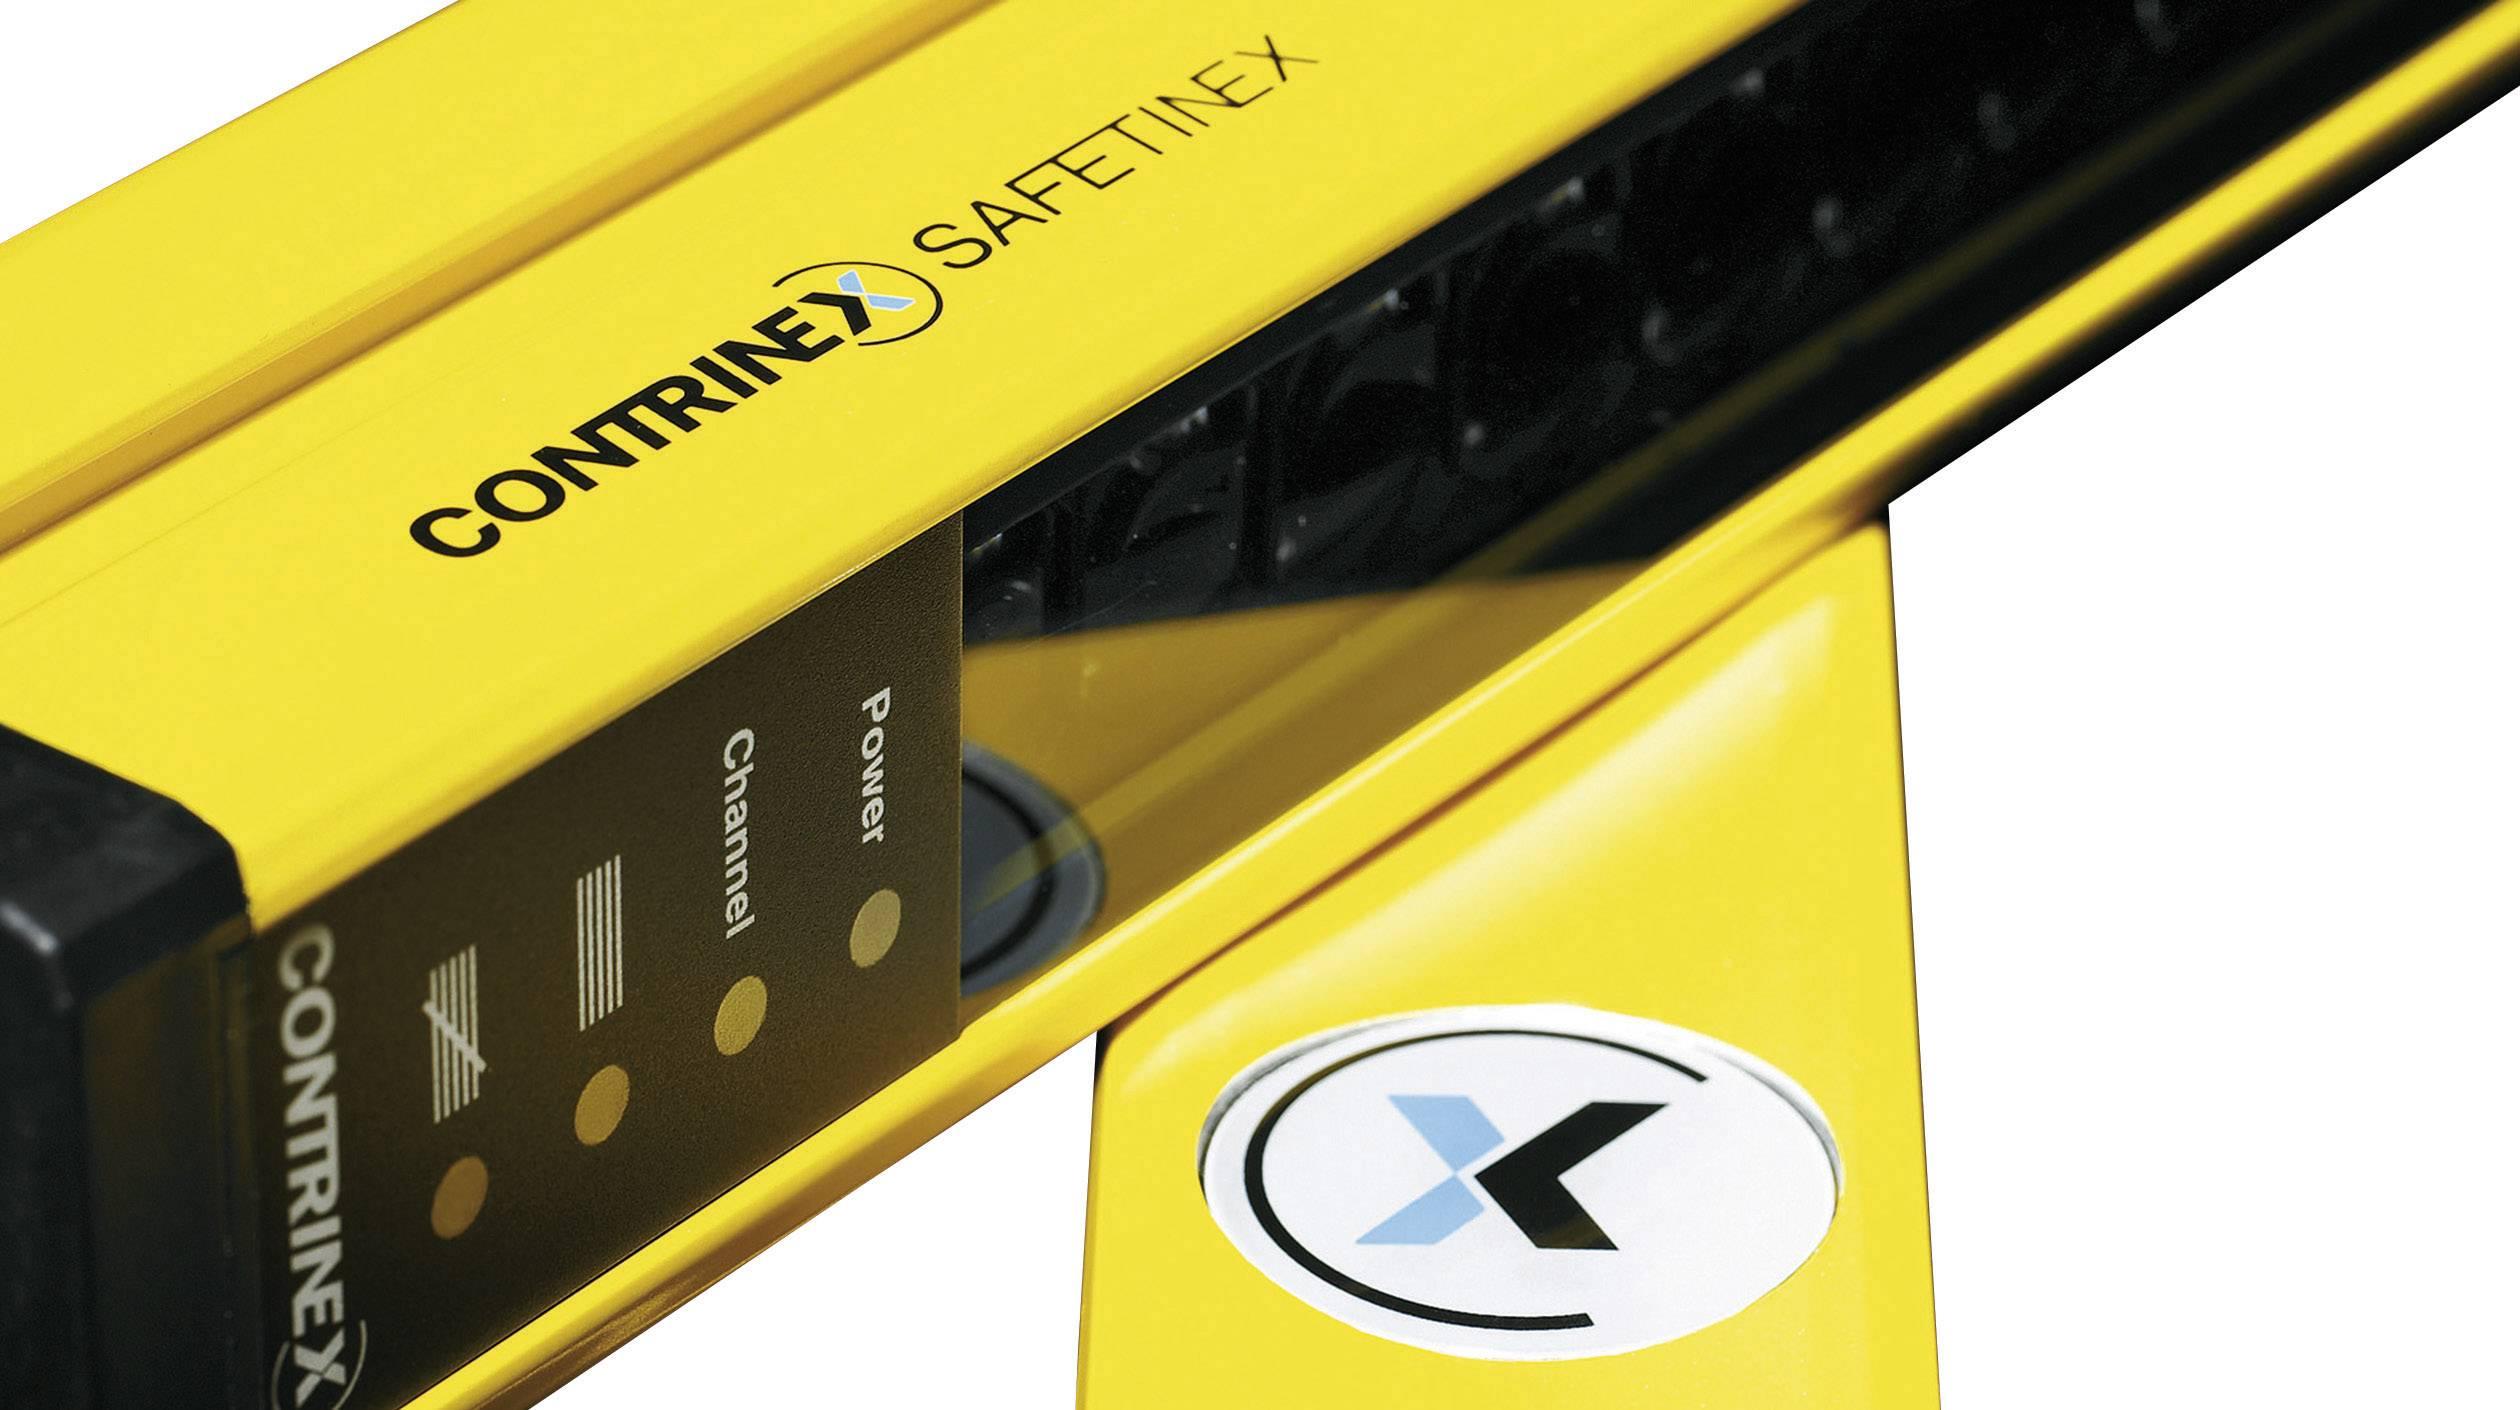 Contrinex YBB-14R4-0150-G012 630 000 106